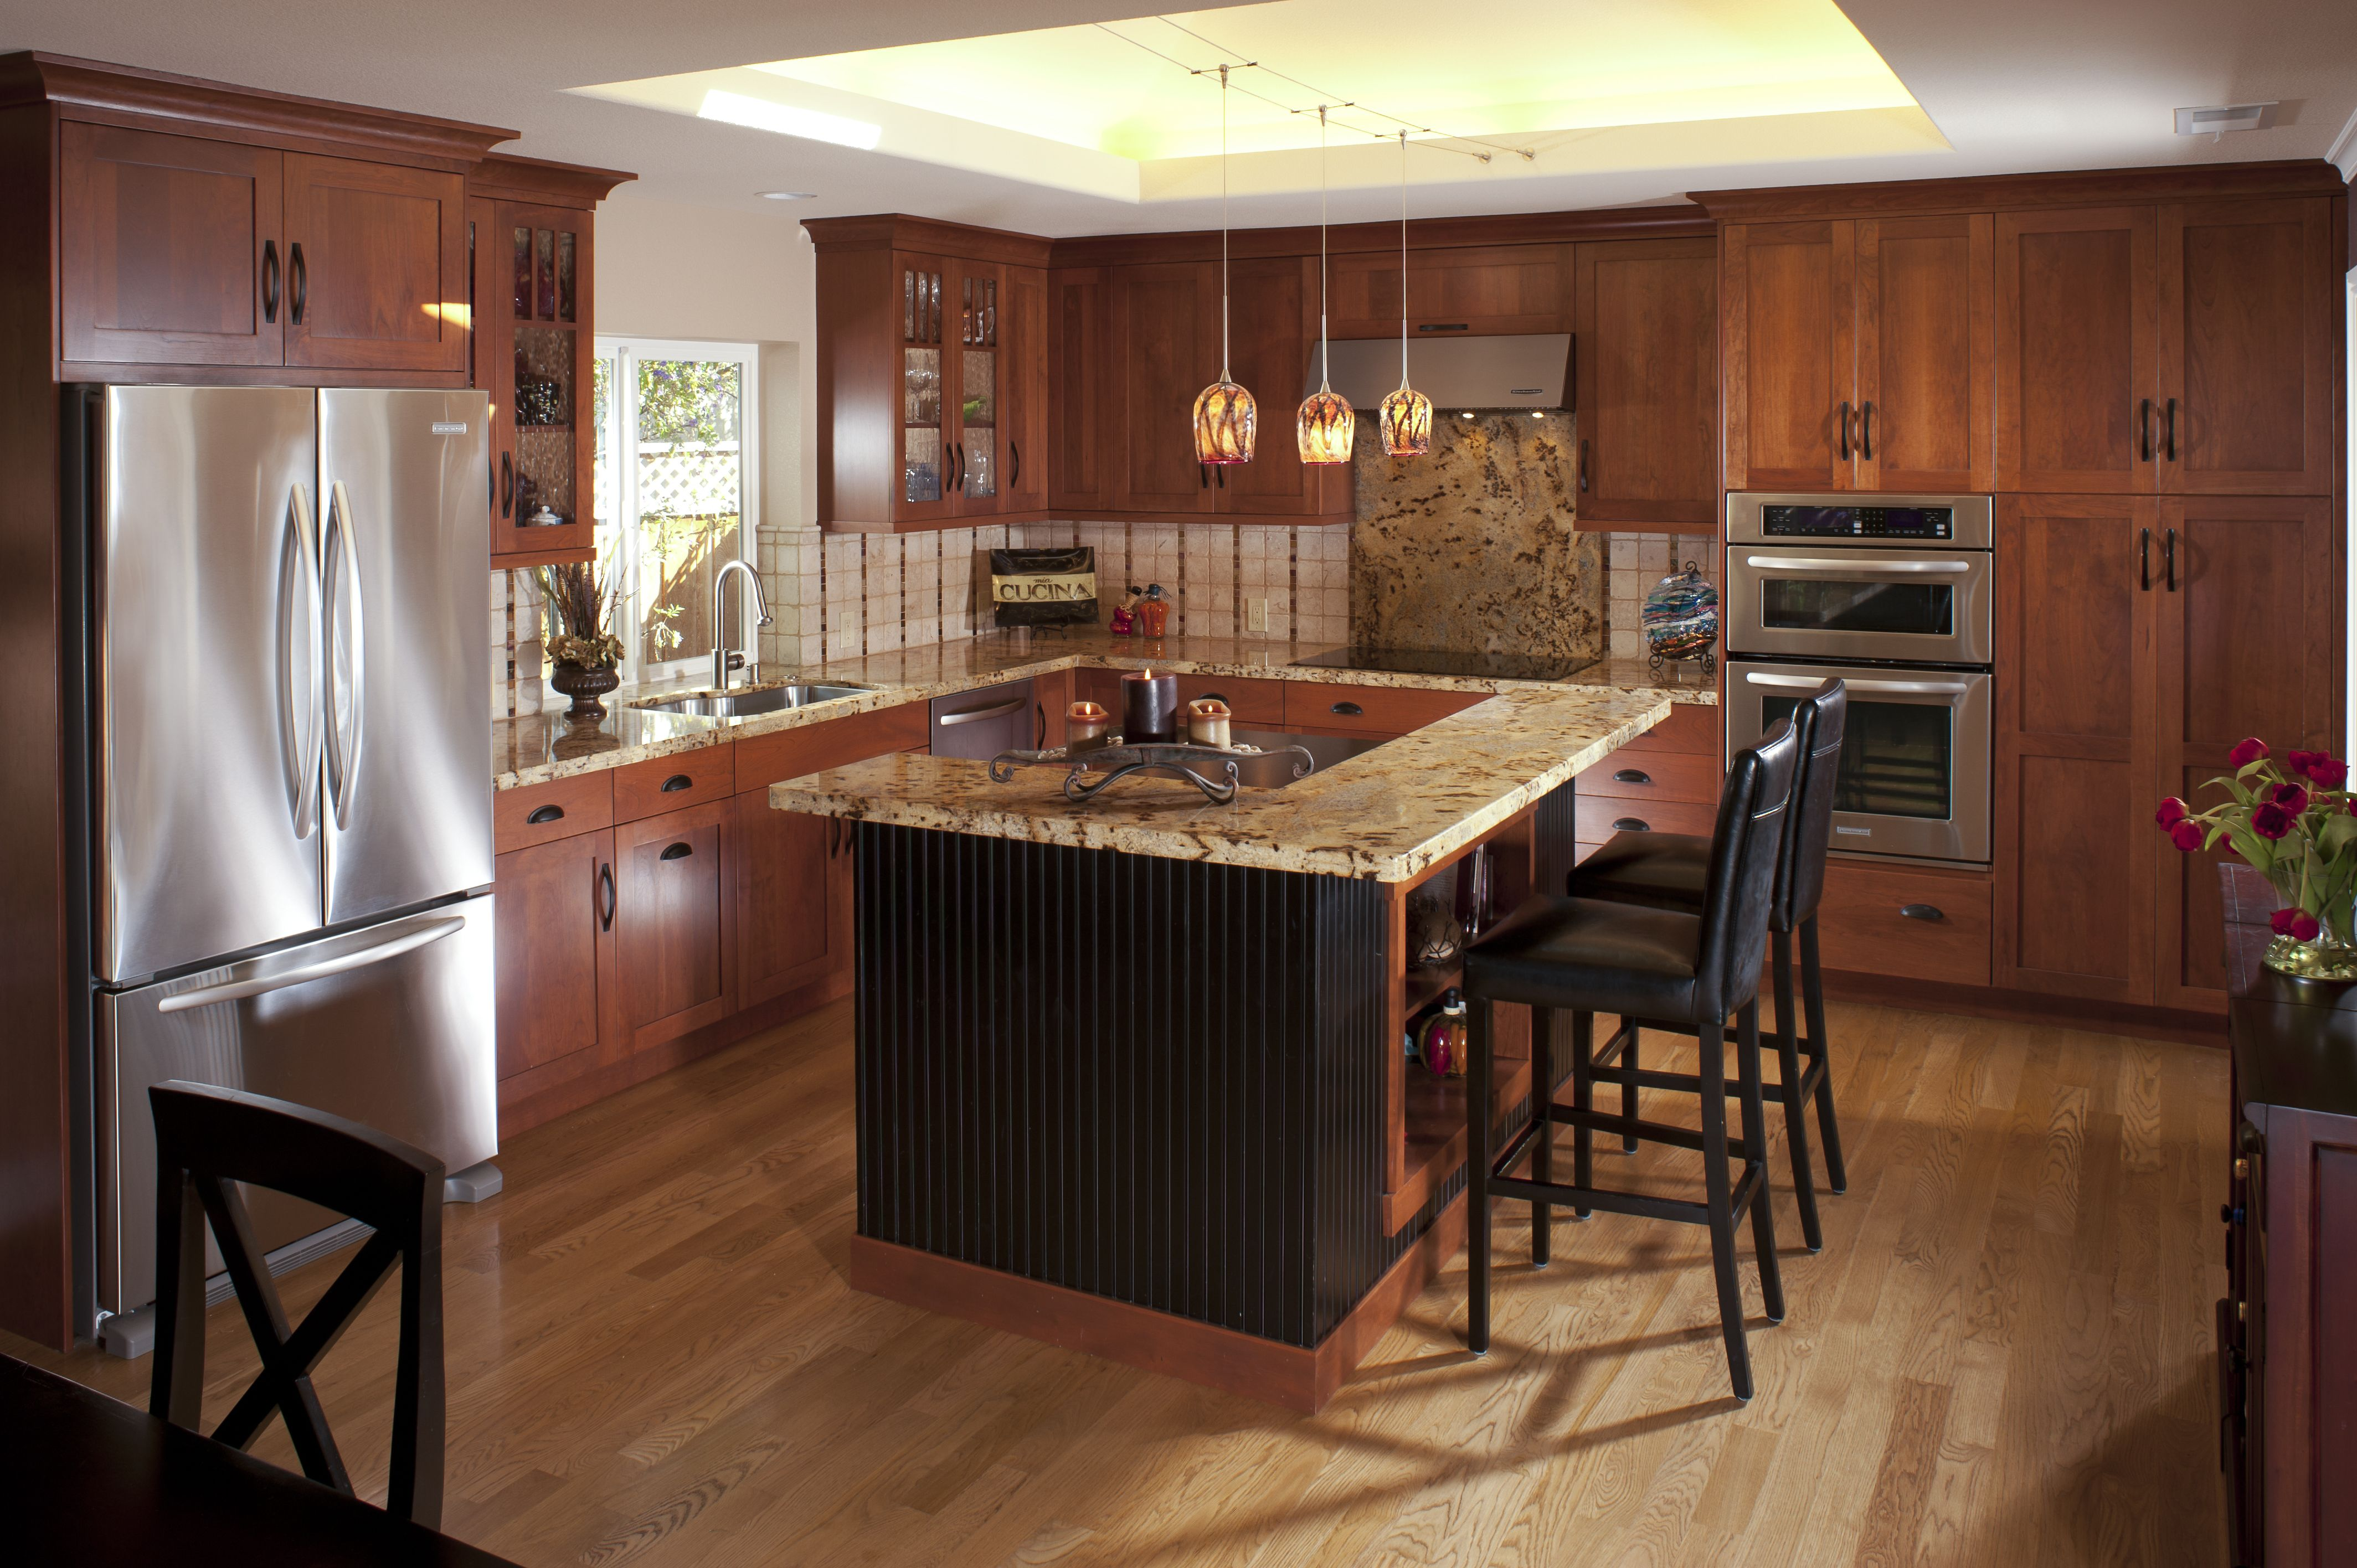 kitchen update kitchen cabinet styles country kitchen decor tuscan kitchen on kitchen remodel timeline id=60857